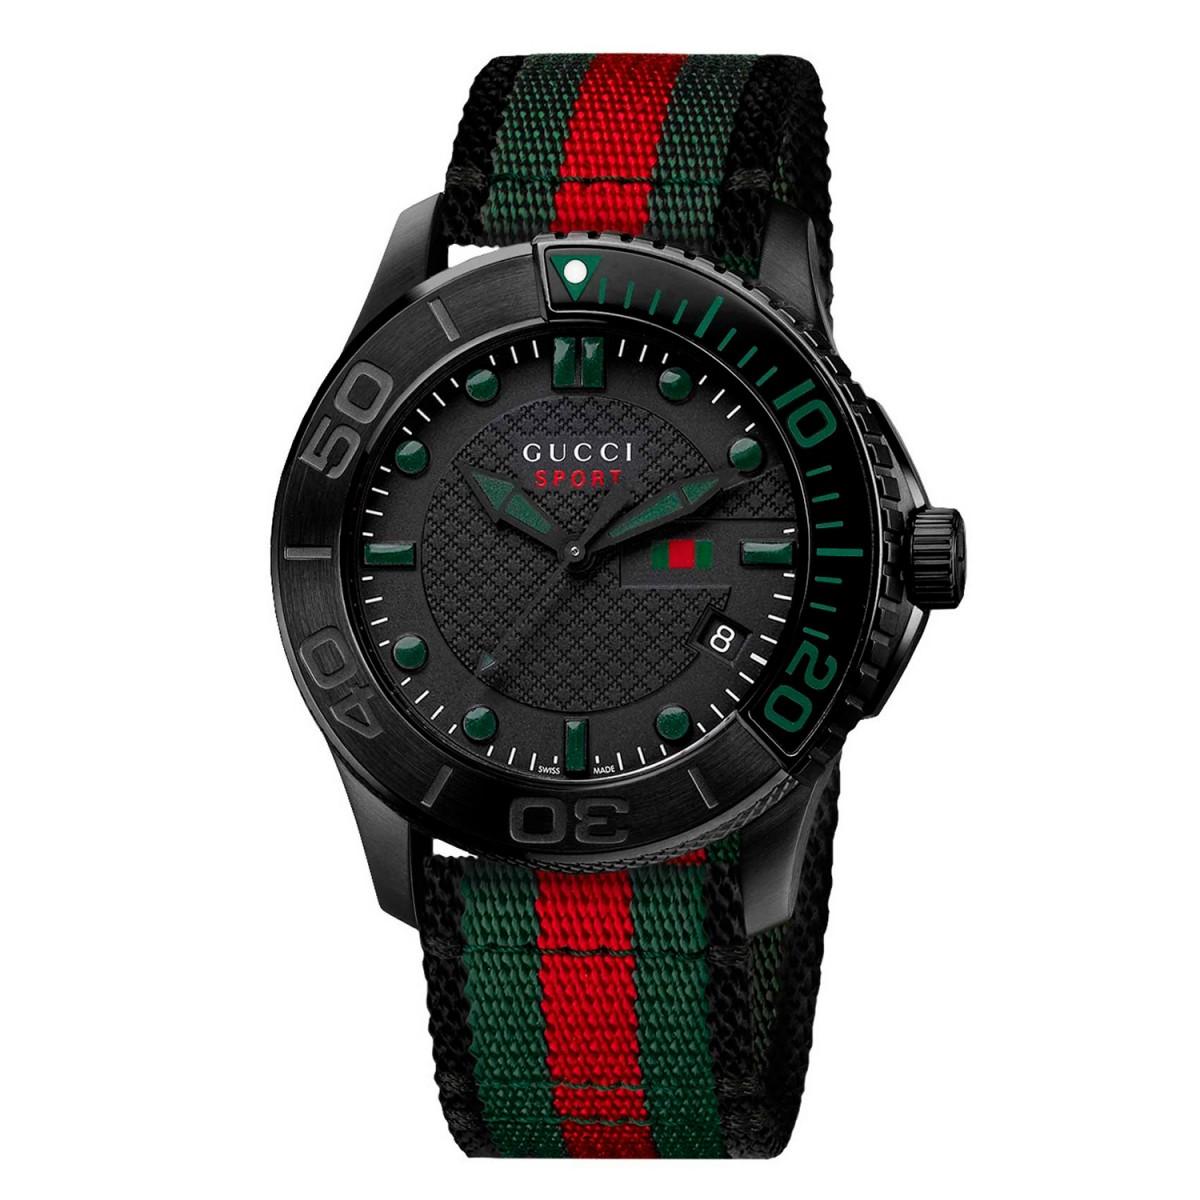 cdb77e9f632 Compre Relógio Gucci Timeless Sport em 10X